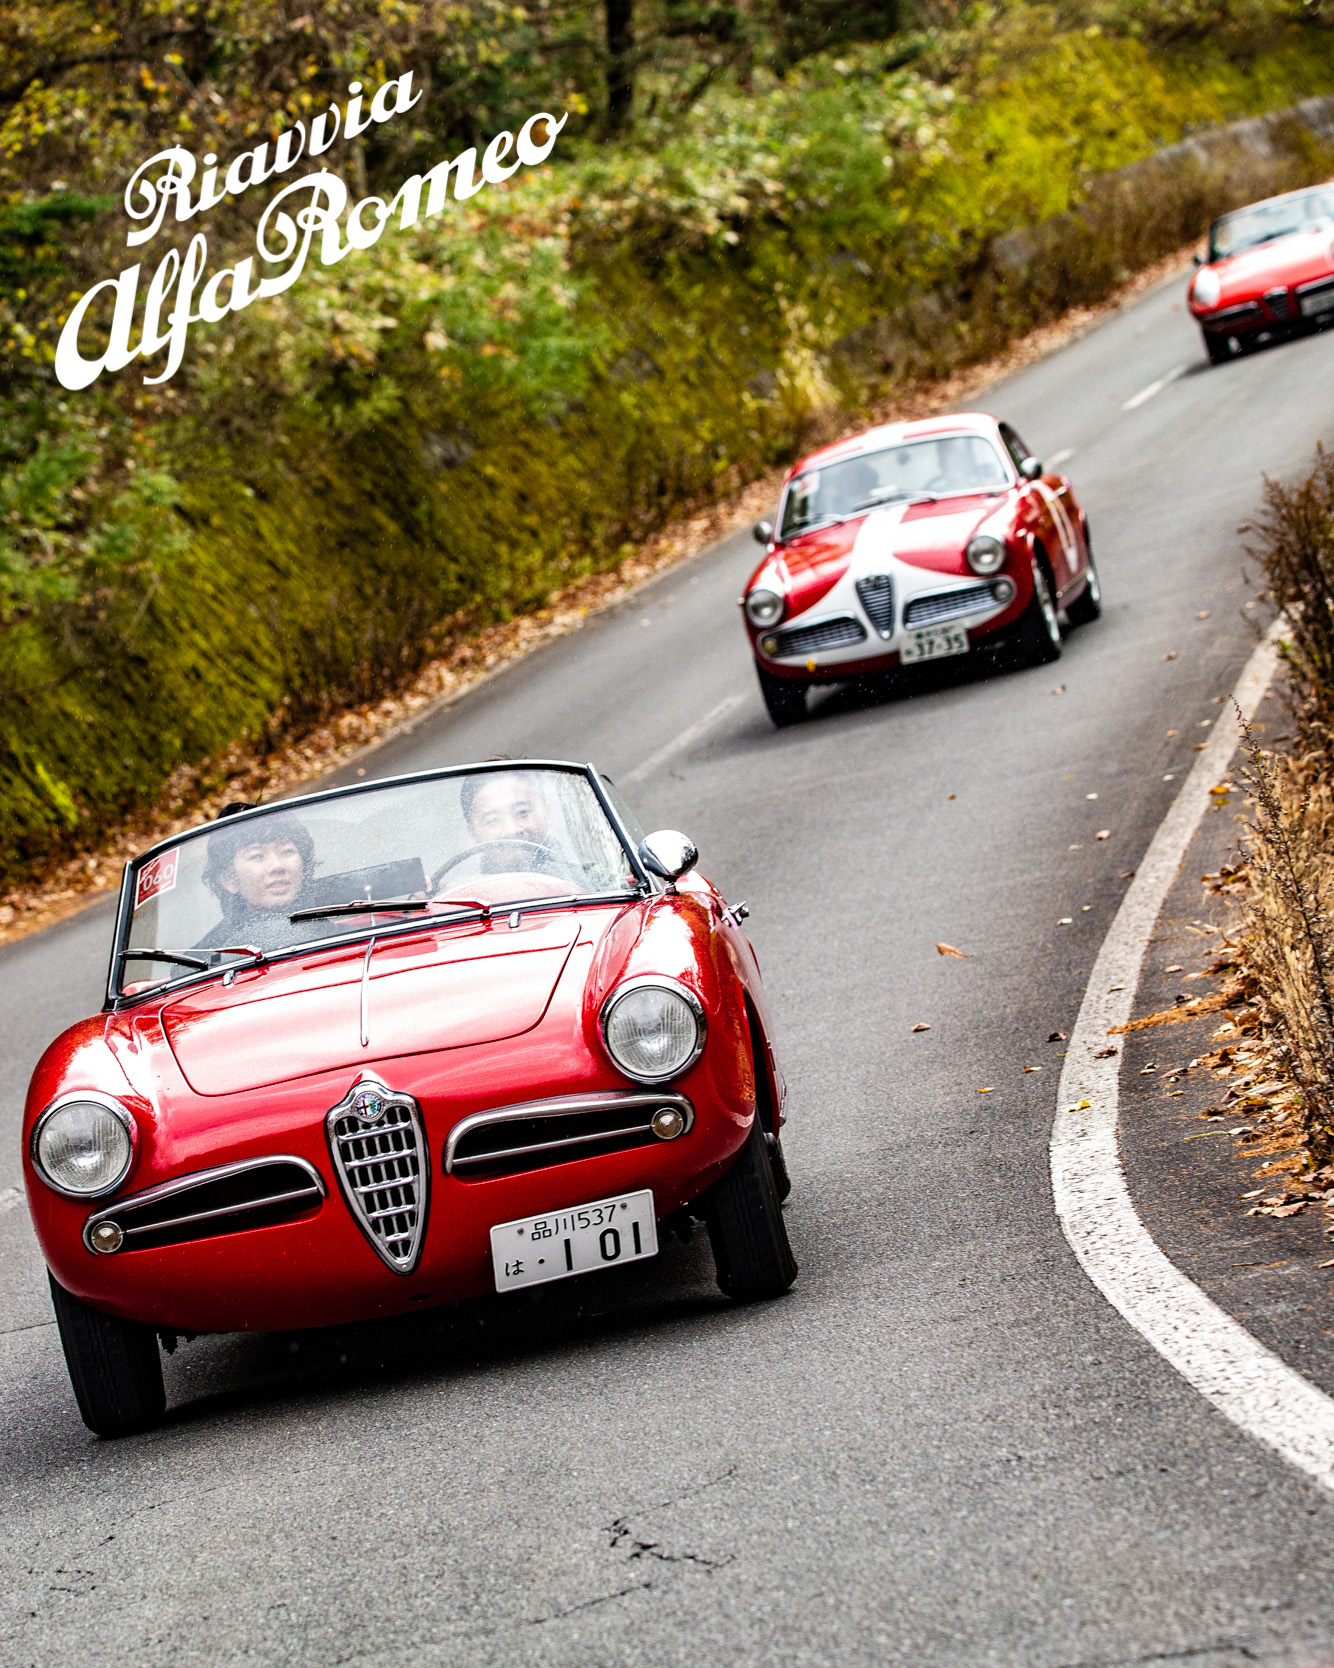 ©︎2020 Riavvia Alfa Romeo